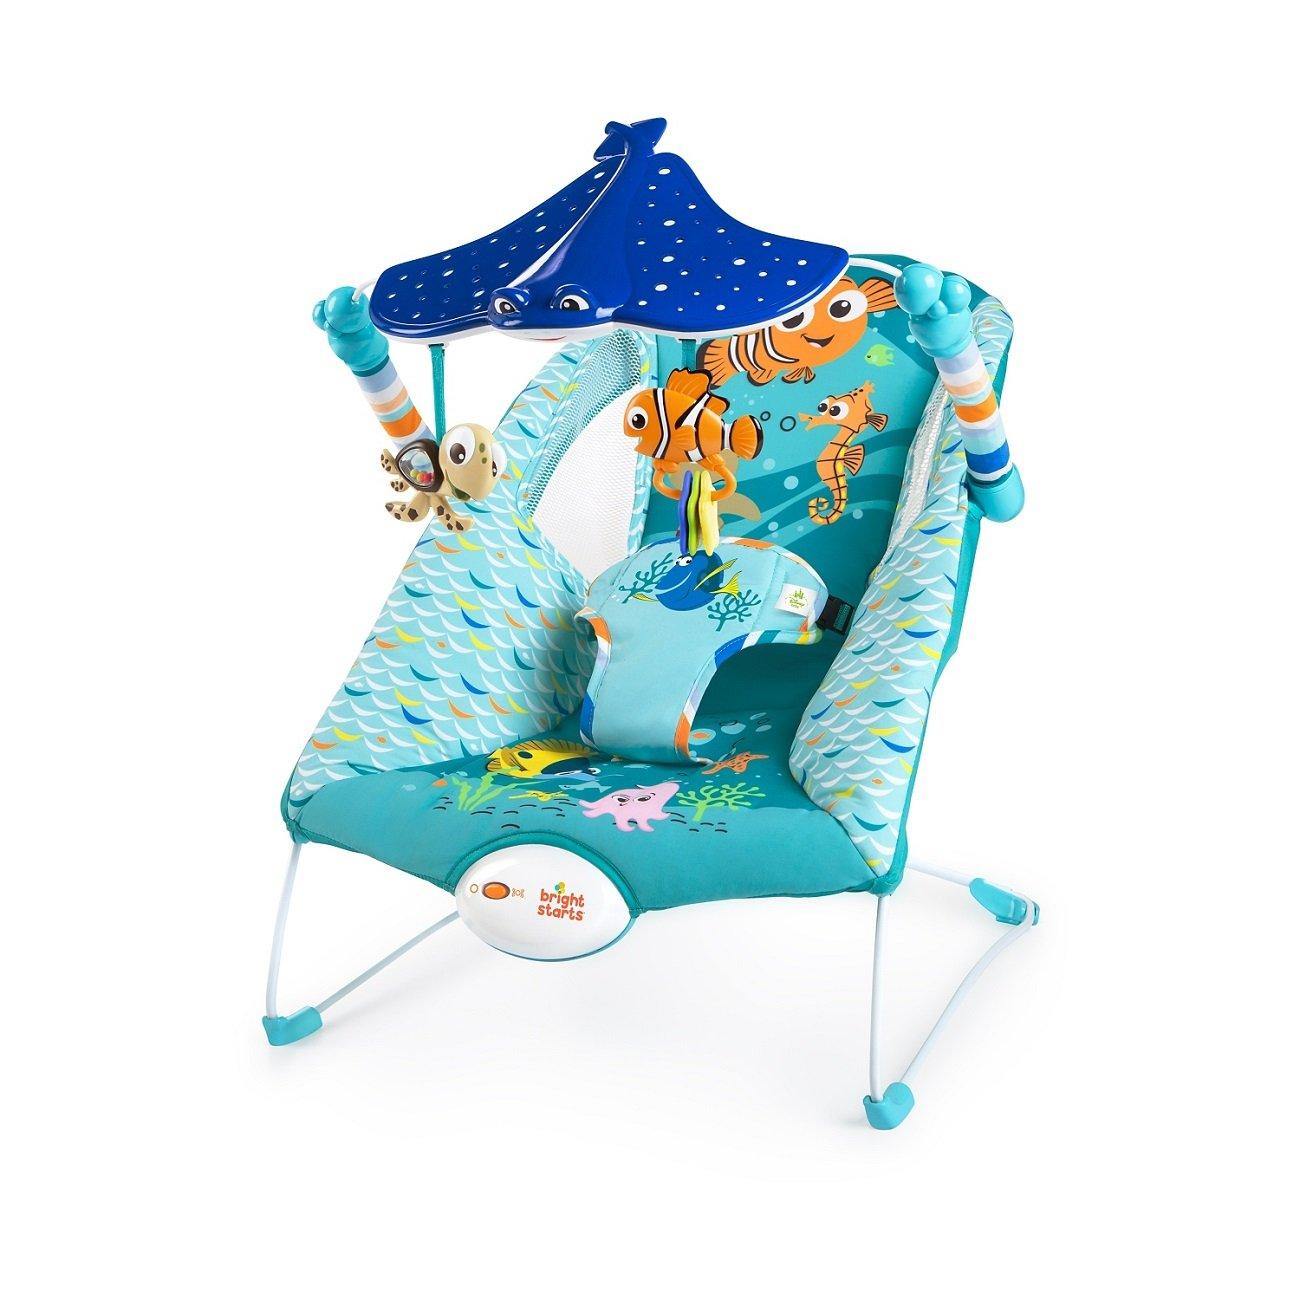 Disney Baby Finding Nemo See Swim Bouncer 74451109049 Ebay